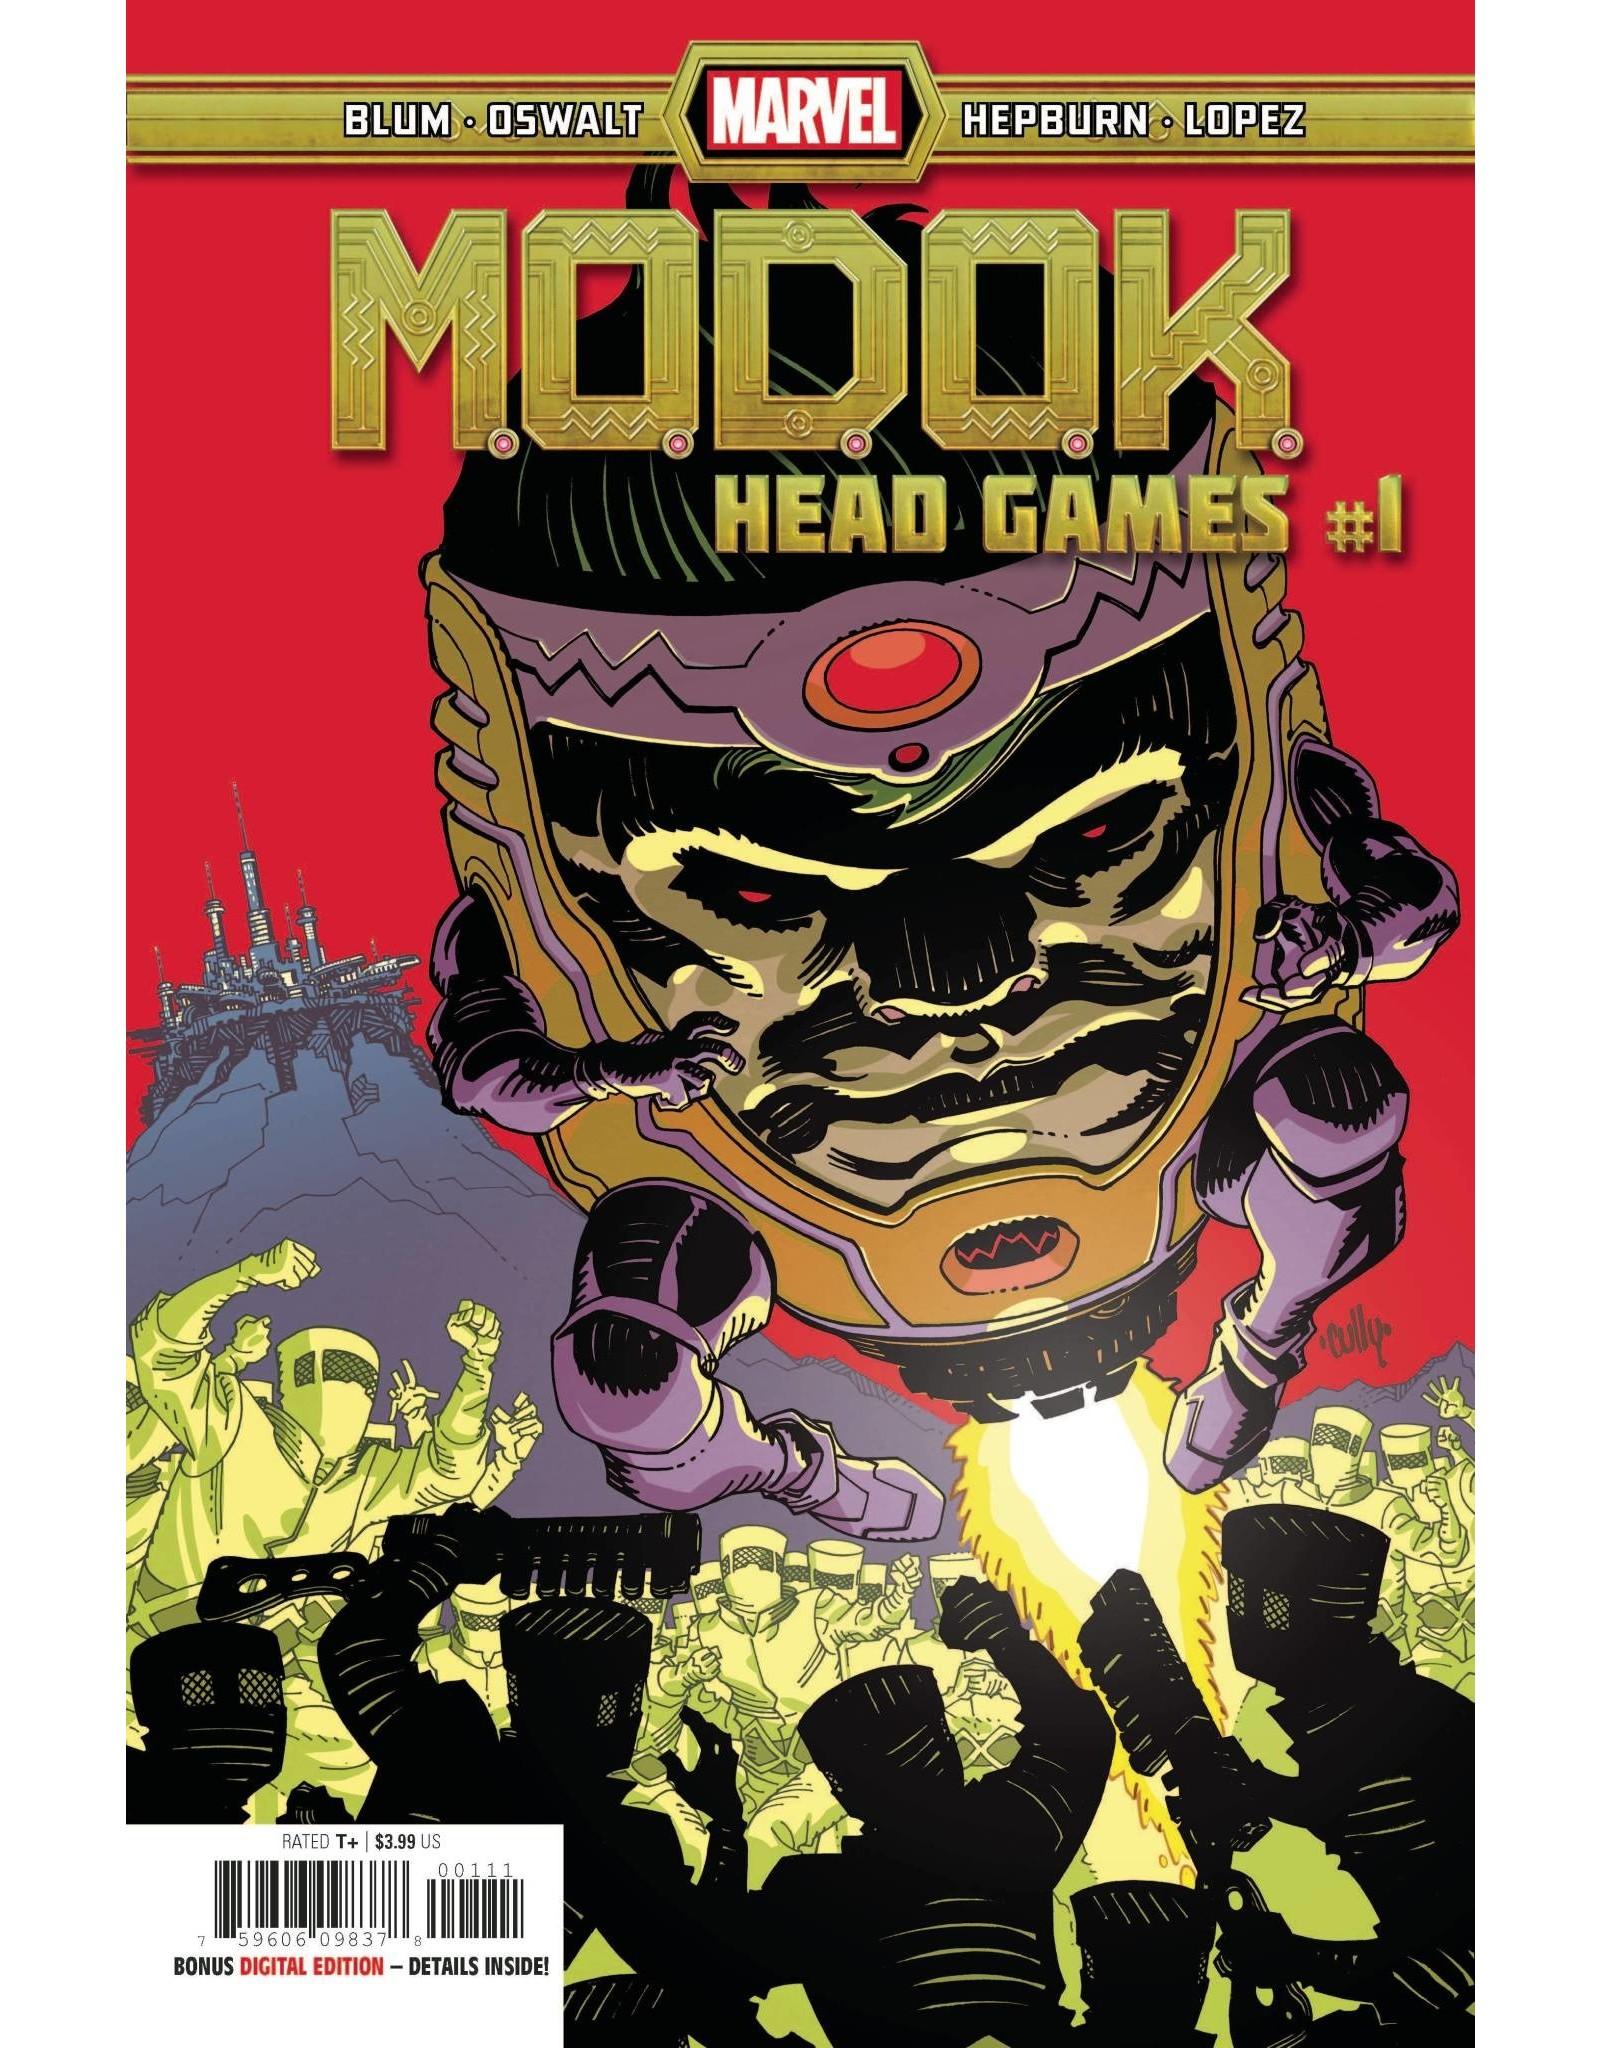 Marvel Comics MODOK HEAD GAMES #1 (OF 4)